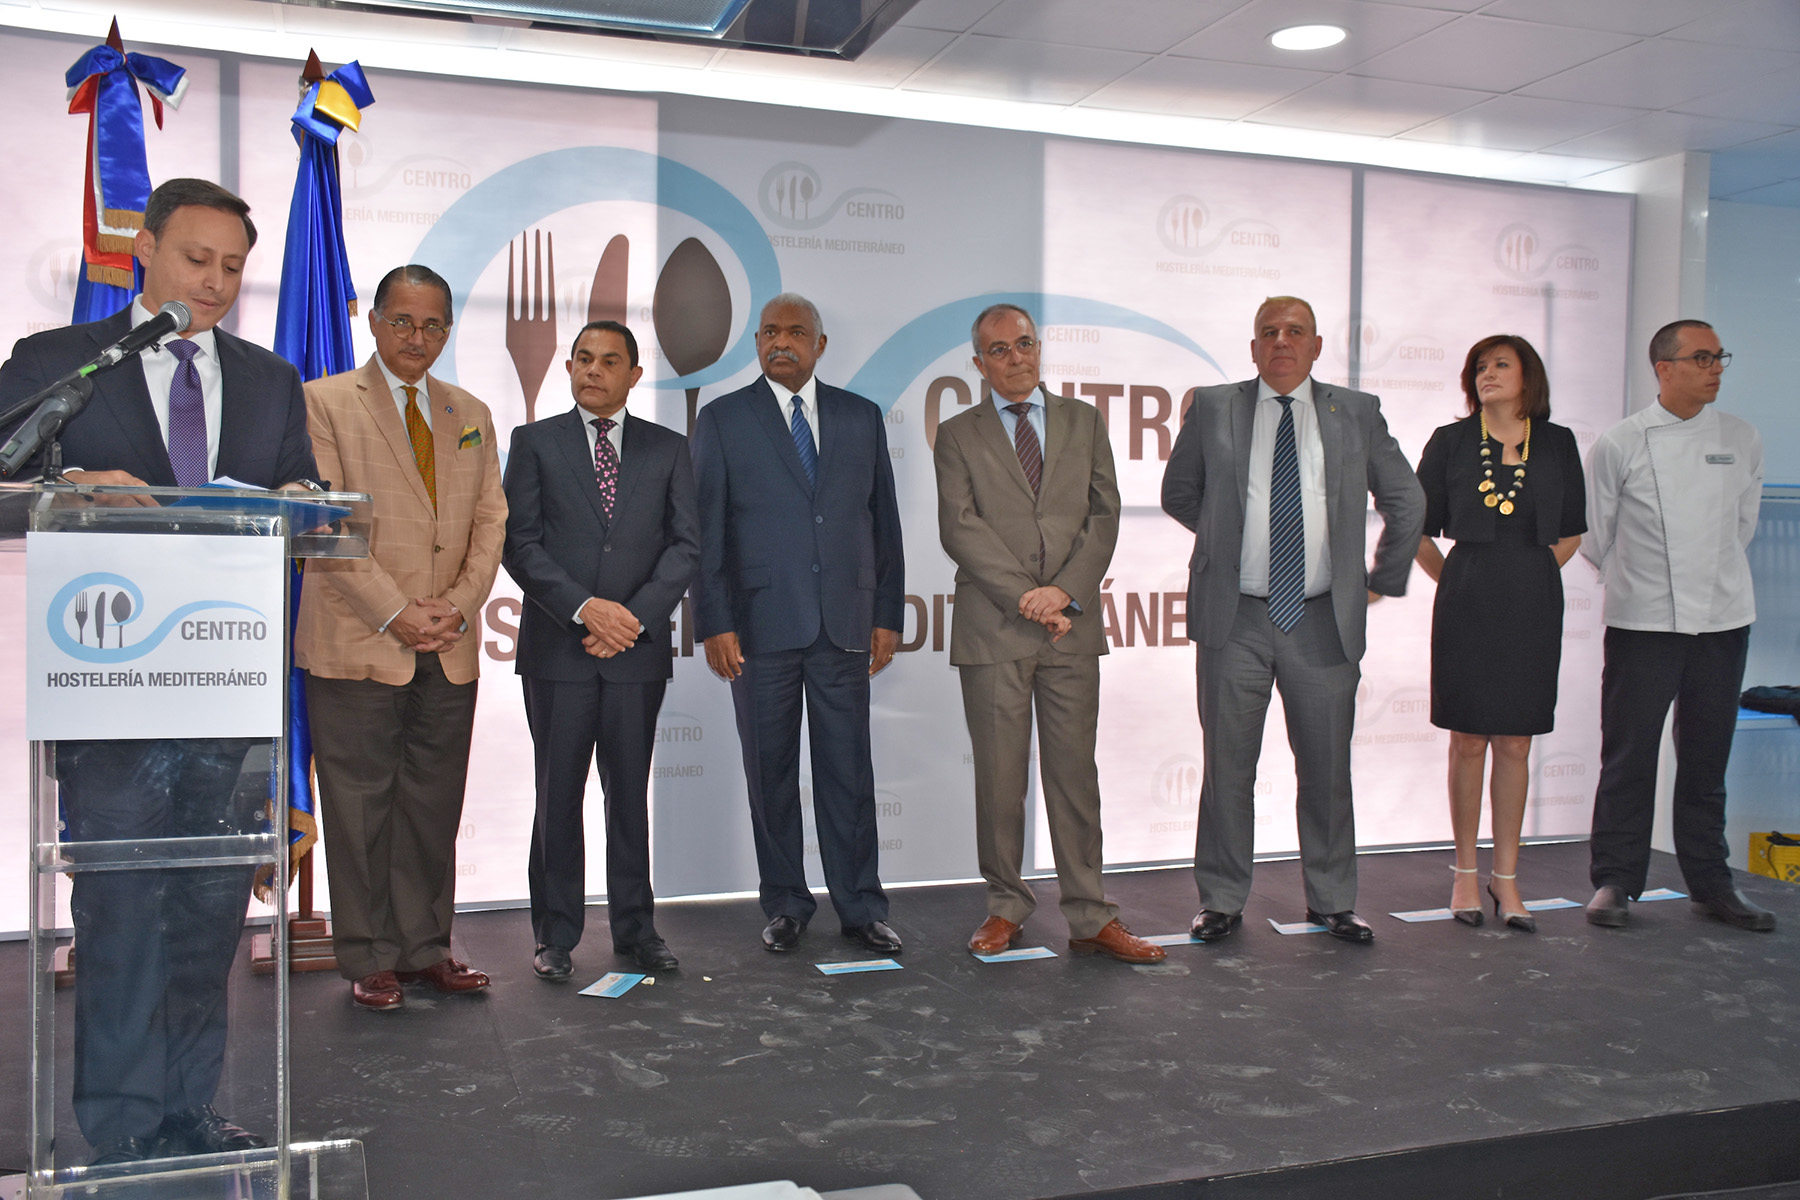 Inauguración Centro Superior Hostelería Mediterráneo